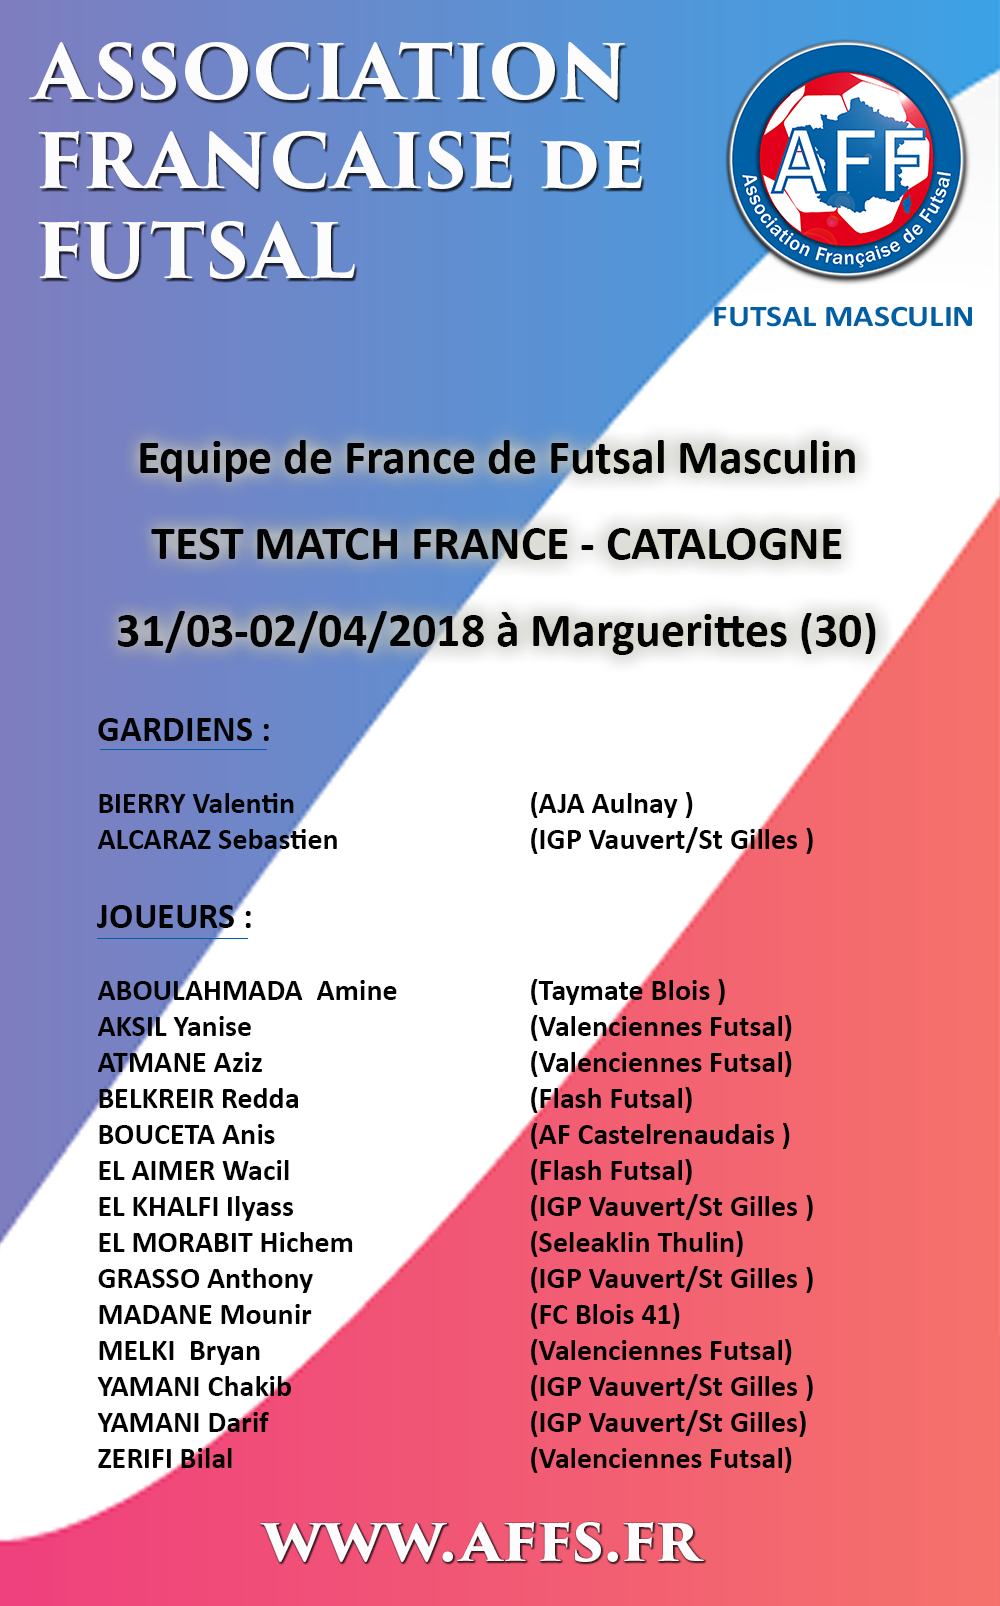 convocation-france-catalogne-edf-masculine-futsal-amf-aff